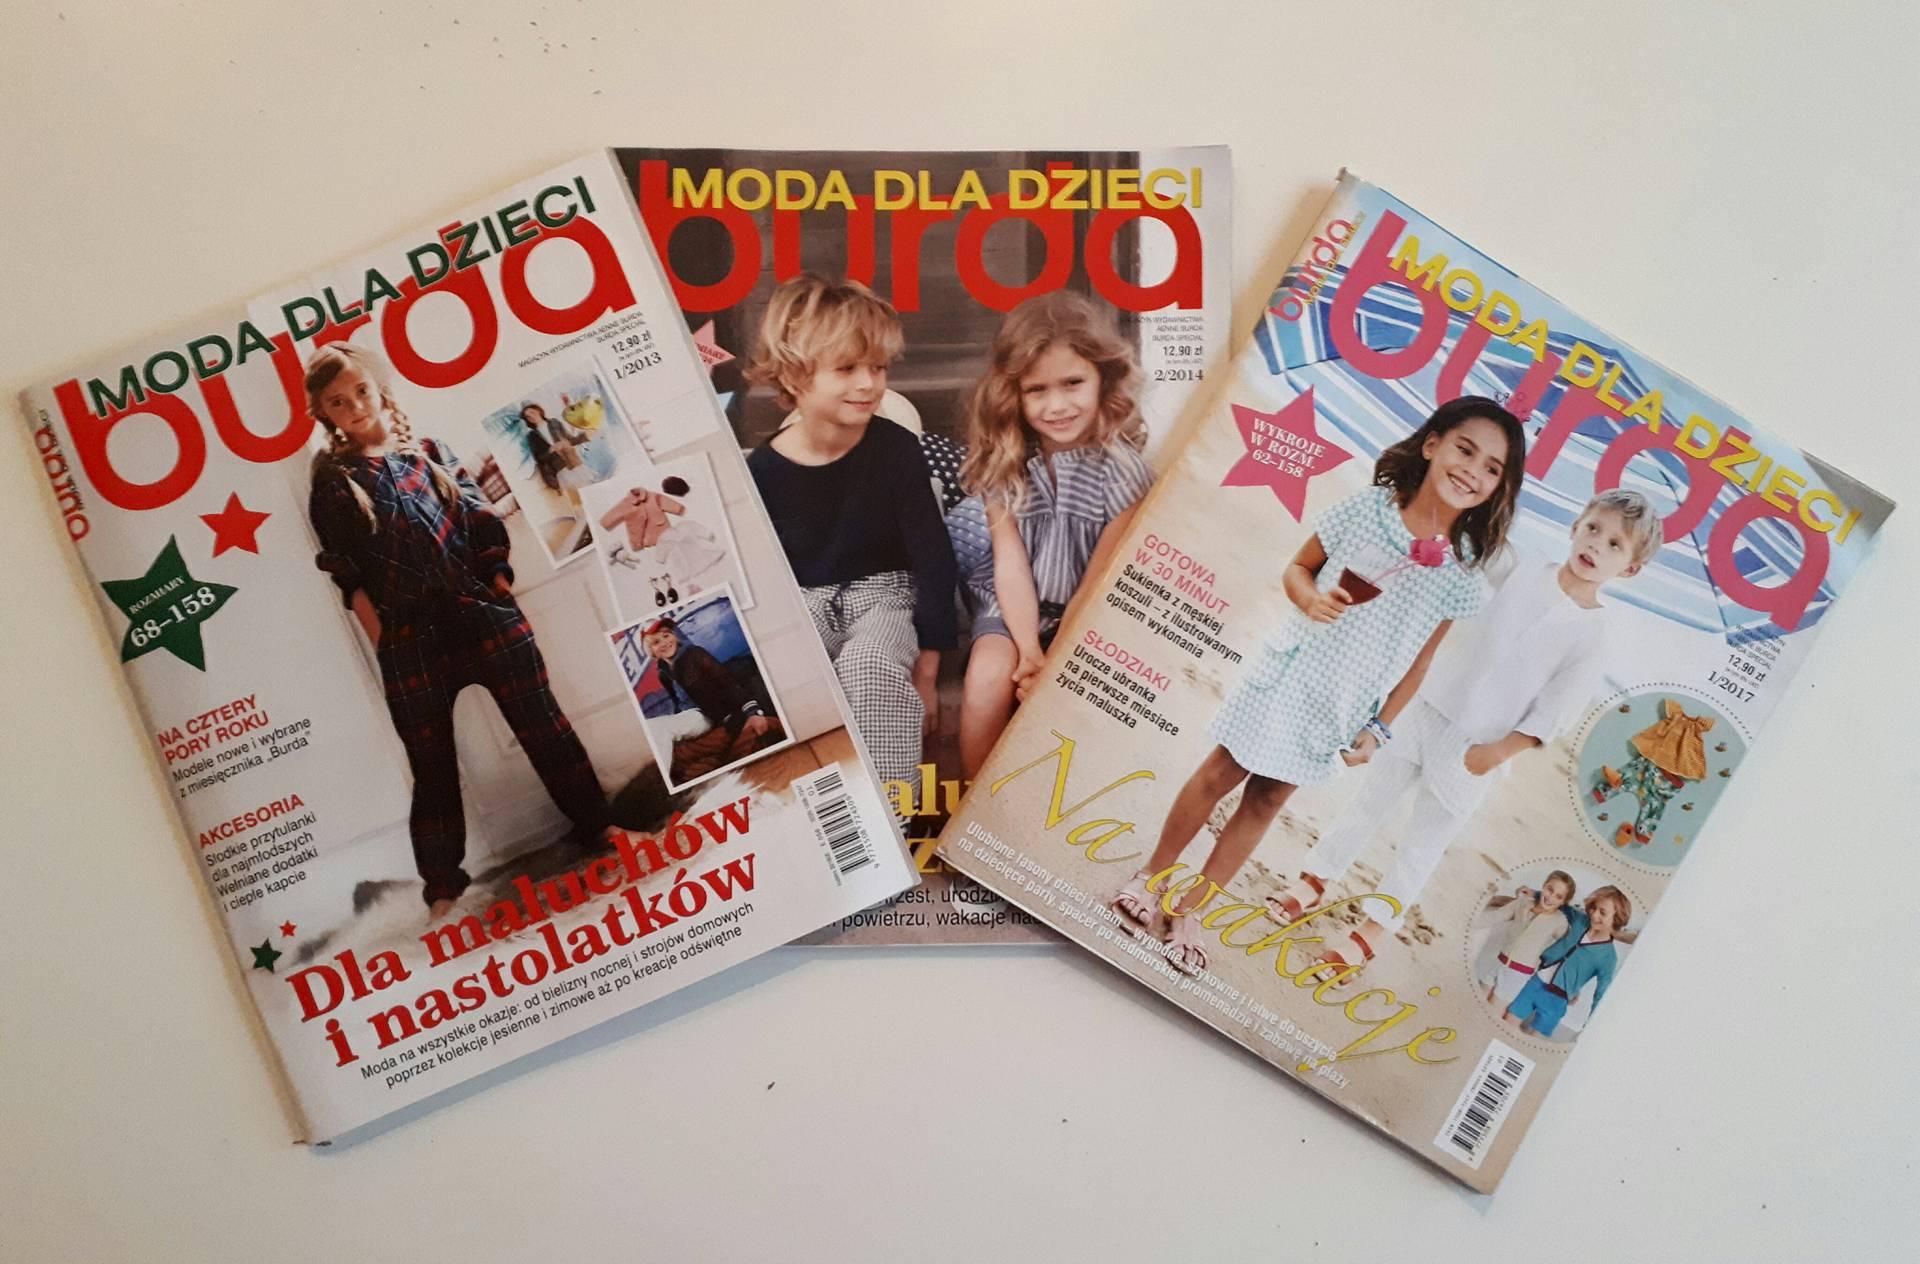 Burda Moda dla dzieci 1/2013 +2/2014 + 1/2017